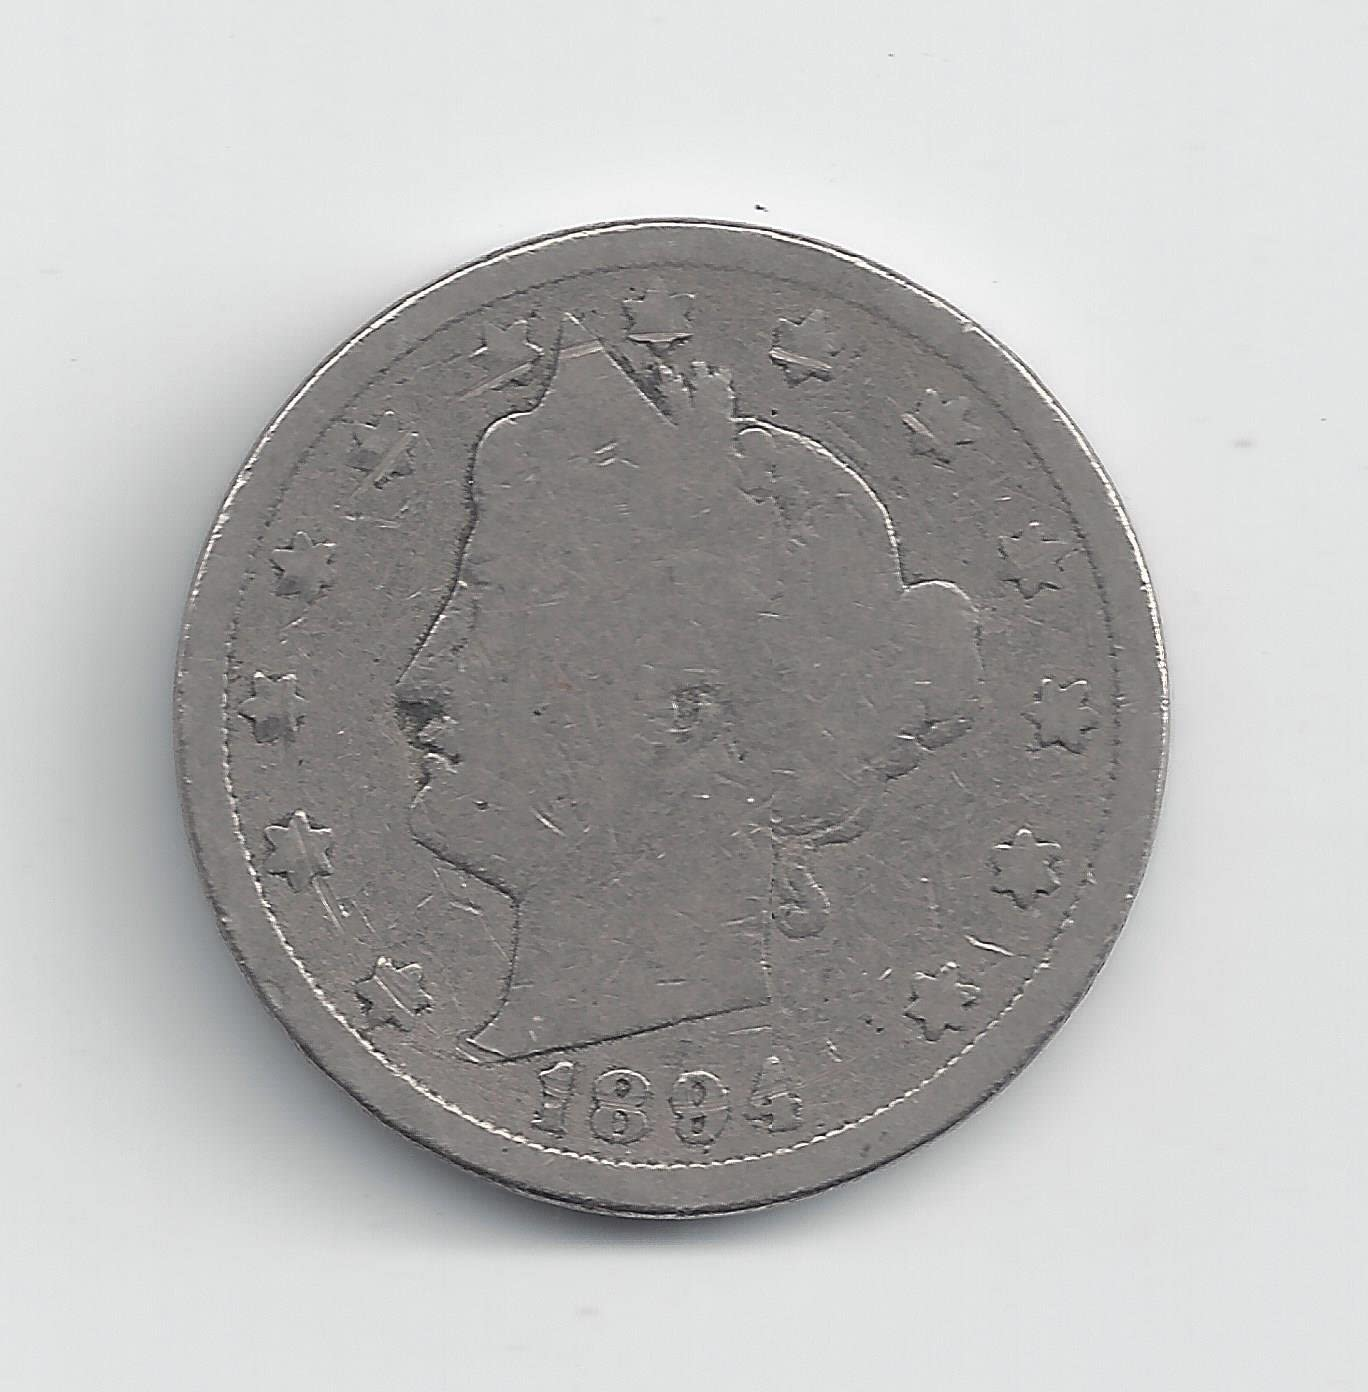 GREAT PRICE! 1894 LIBERTY HEAD NICKEL GOOD